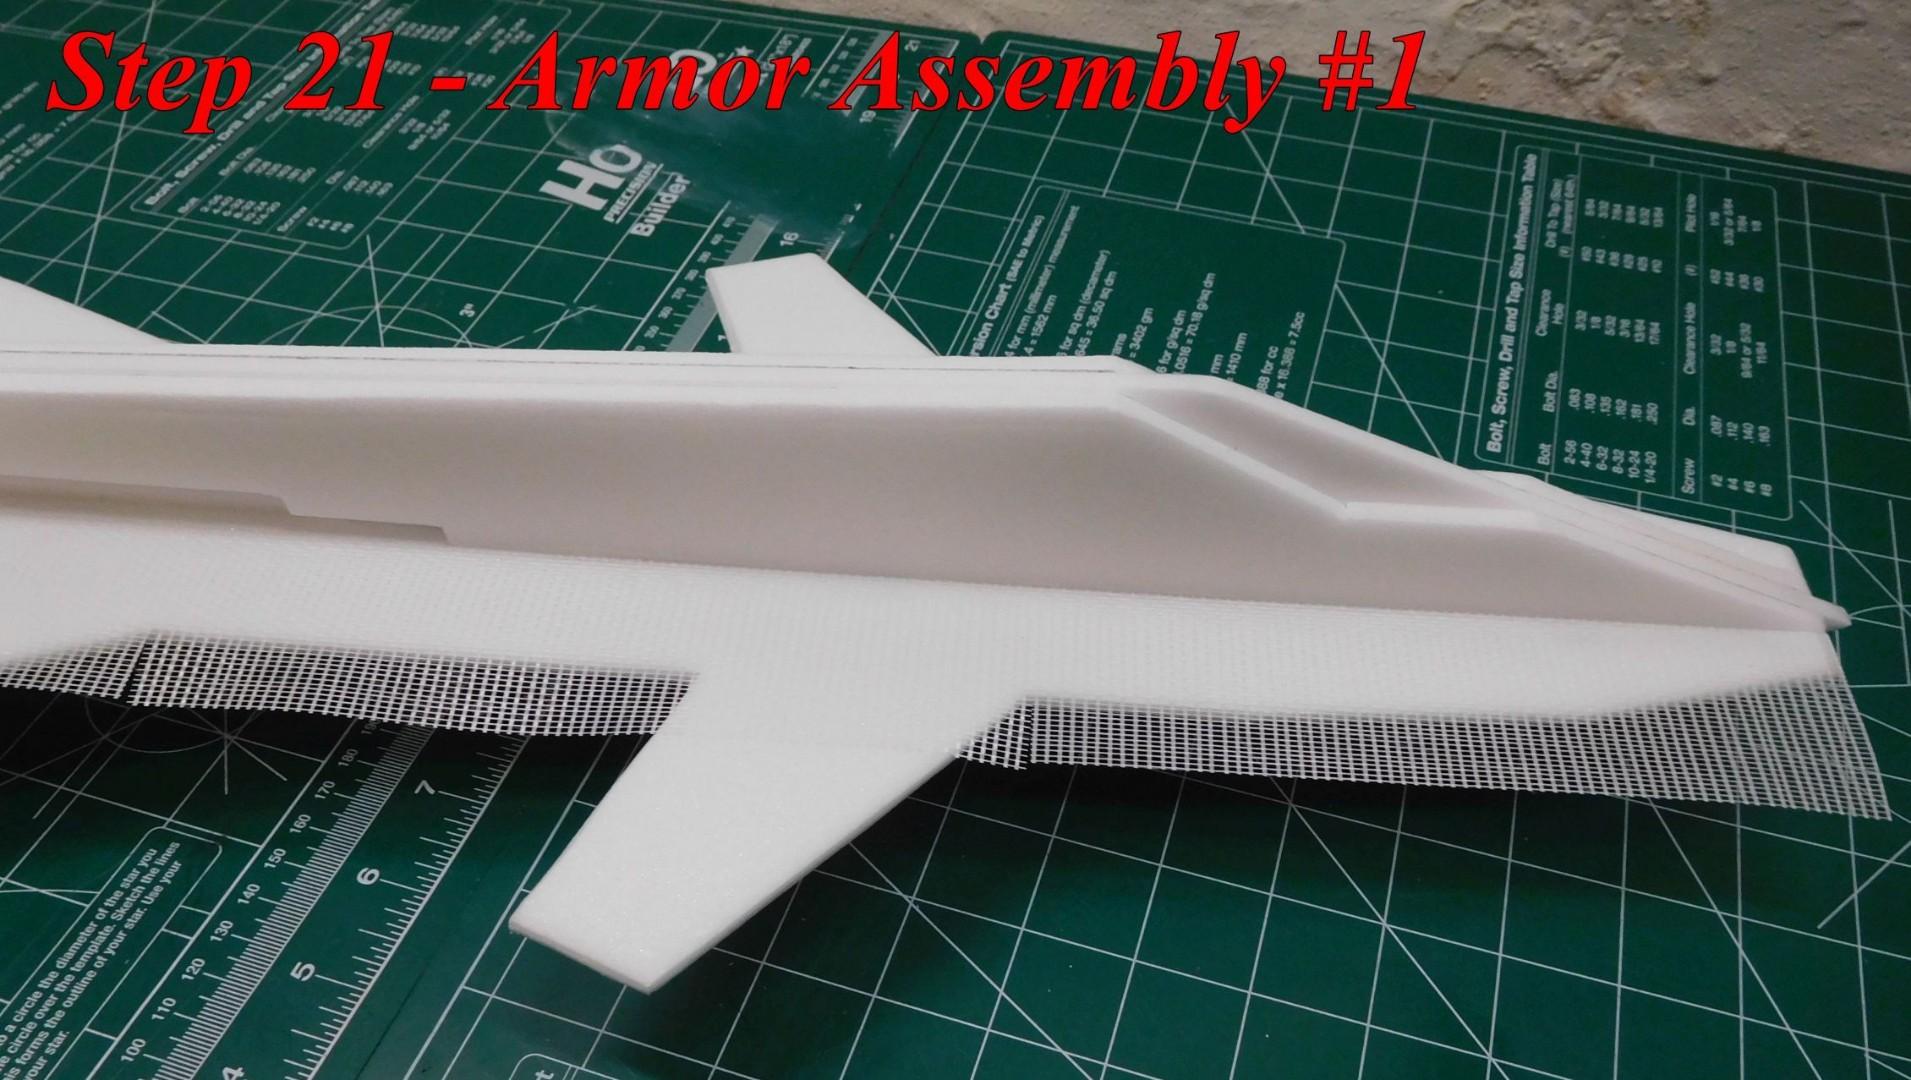 Step 21 Pic 1 - Armor Assembly #1.jpg